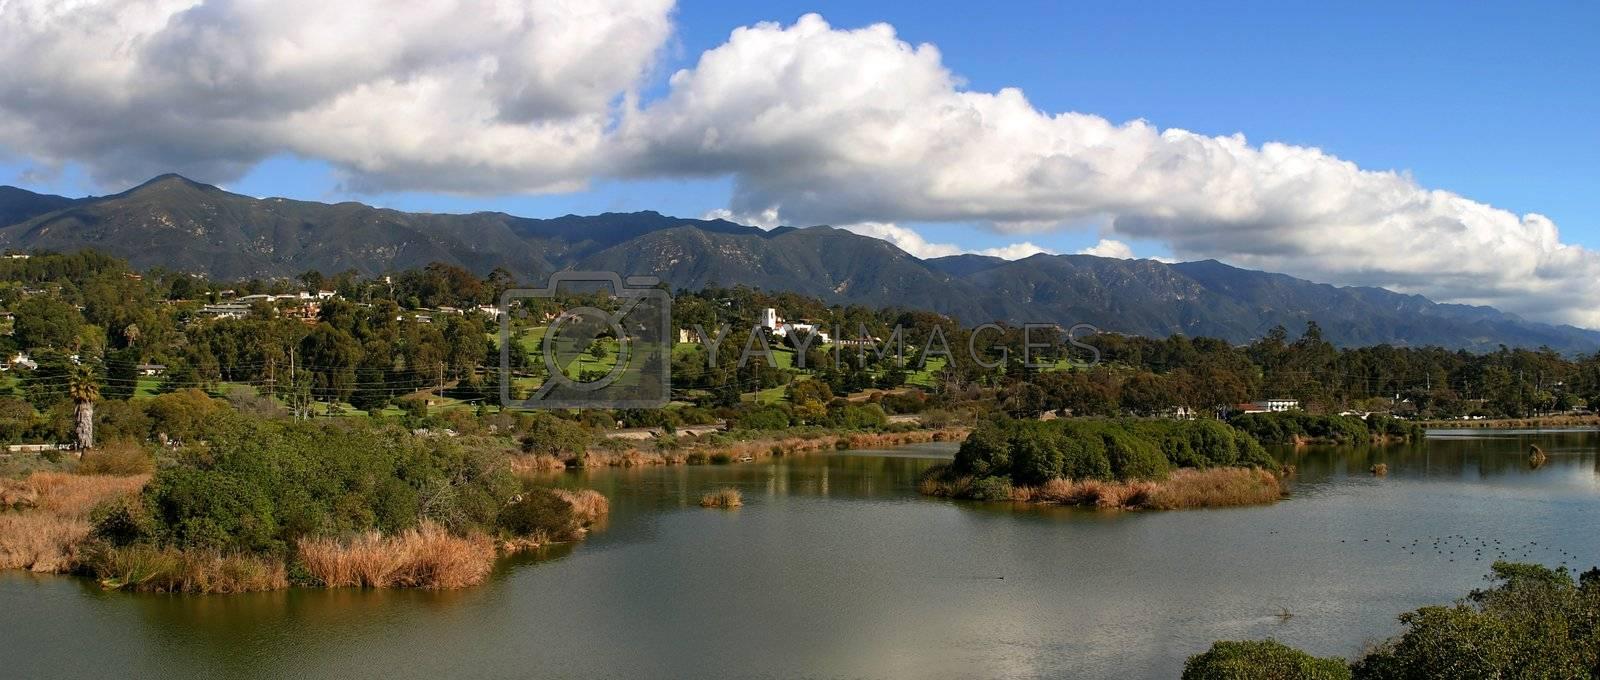 Santa Barbara (4696) by hlehnerer